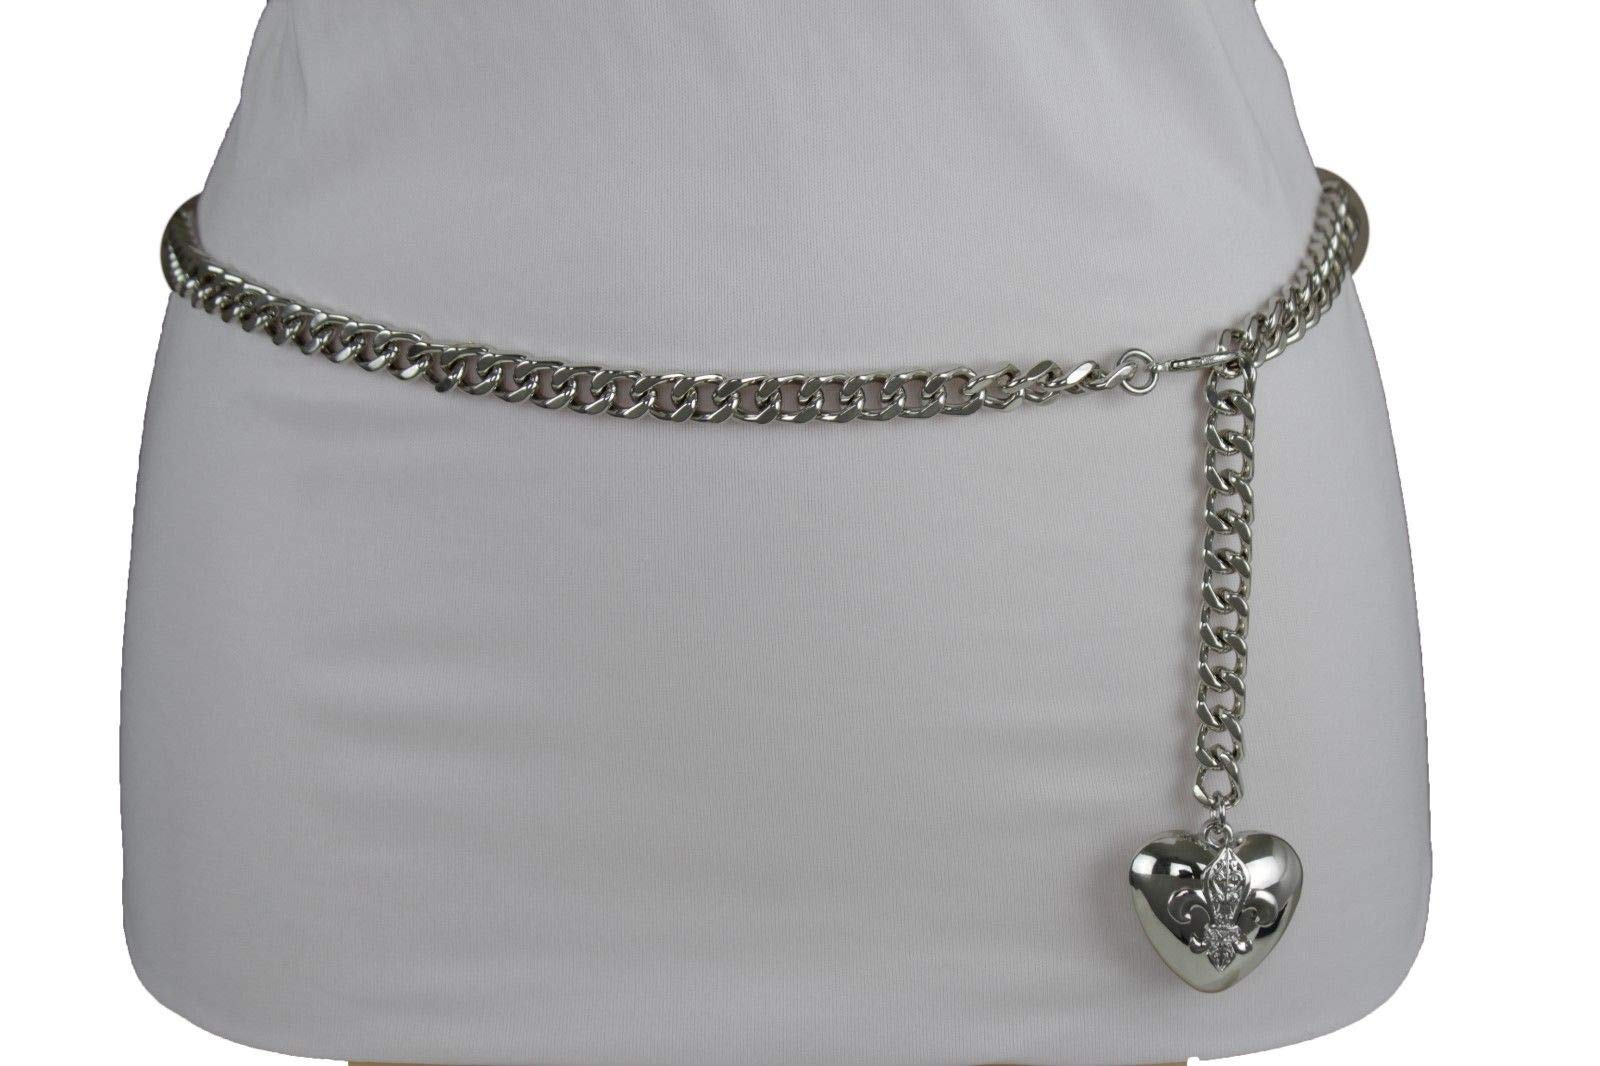 Women Hip Waist Silver Metal Chain Fashion Belt Love Heart Buckle Charm XS S M by RIX Fashion Luxury (Image #3)